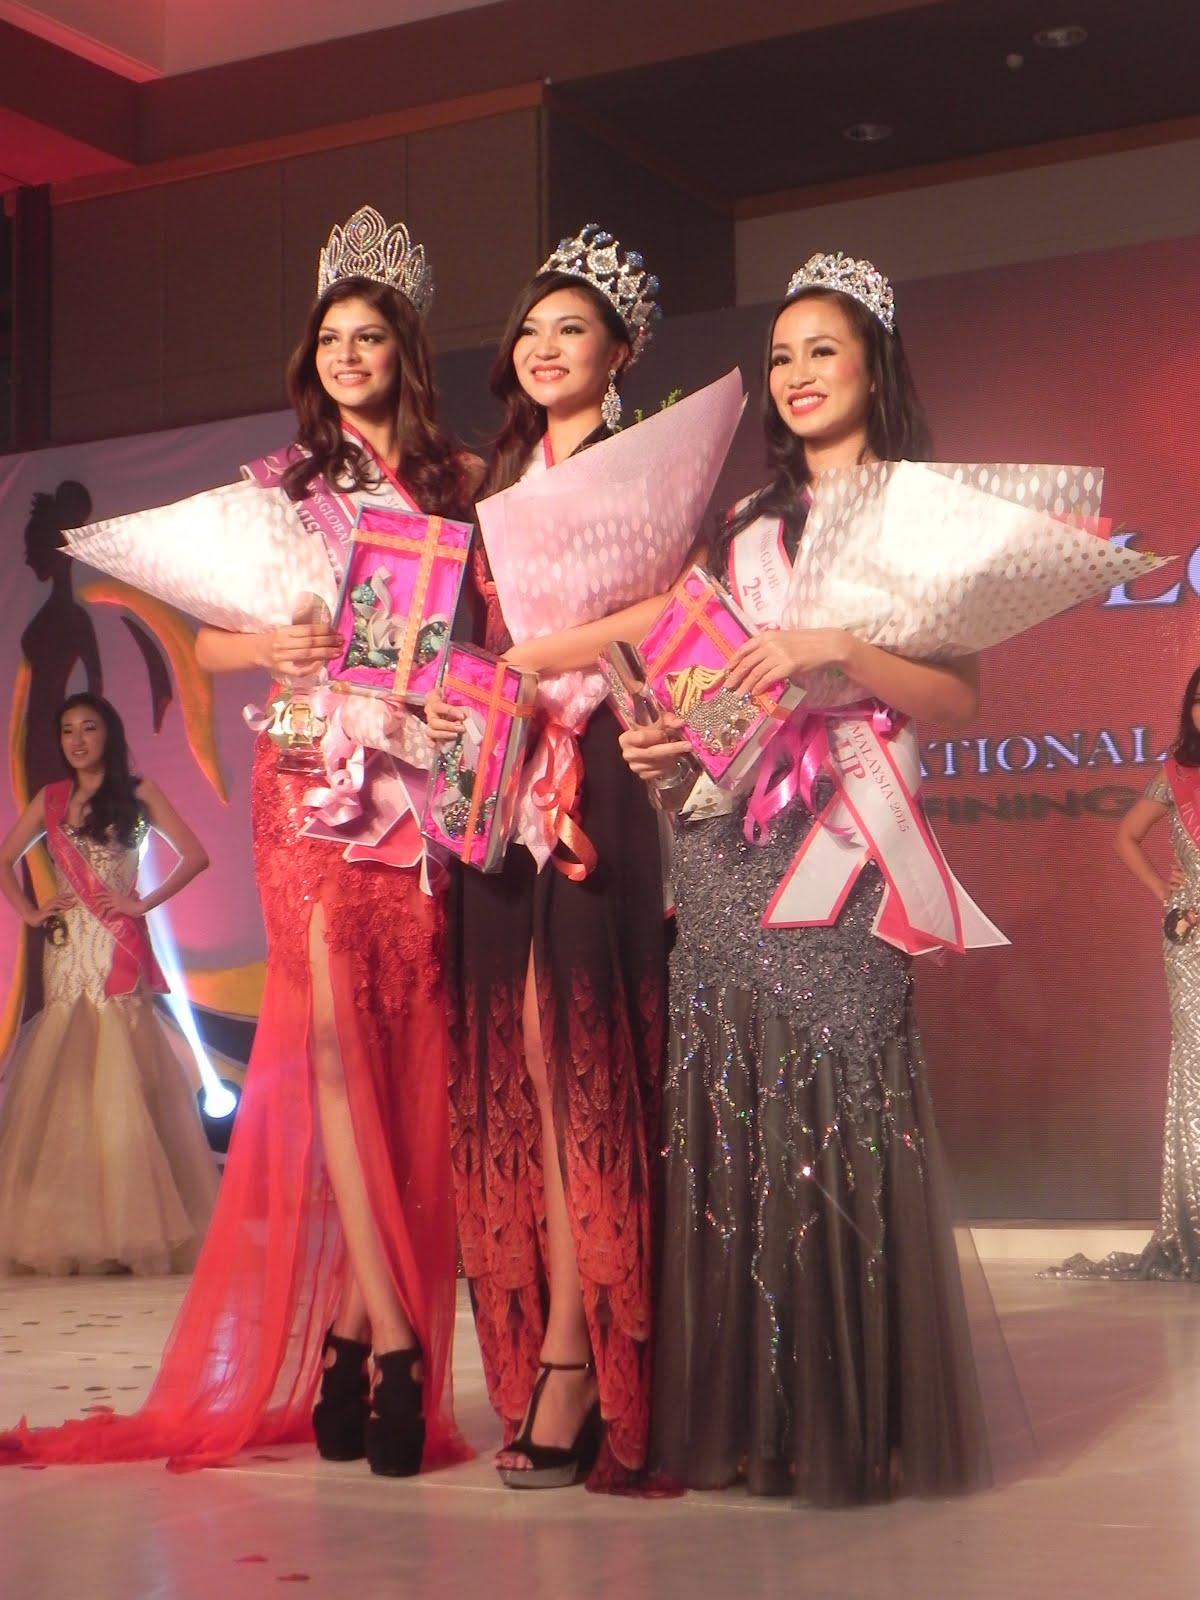 MISS GLOBAL INTERNATIONAL MALAYSIA 2015 TOP 3 WINNERS. CONGRATS!